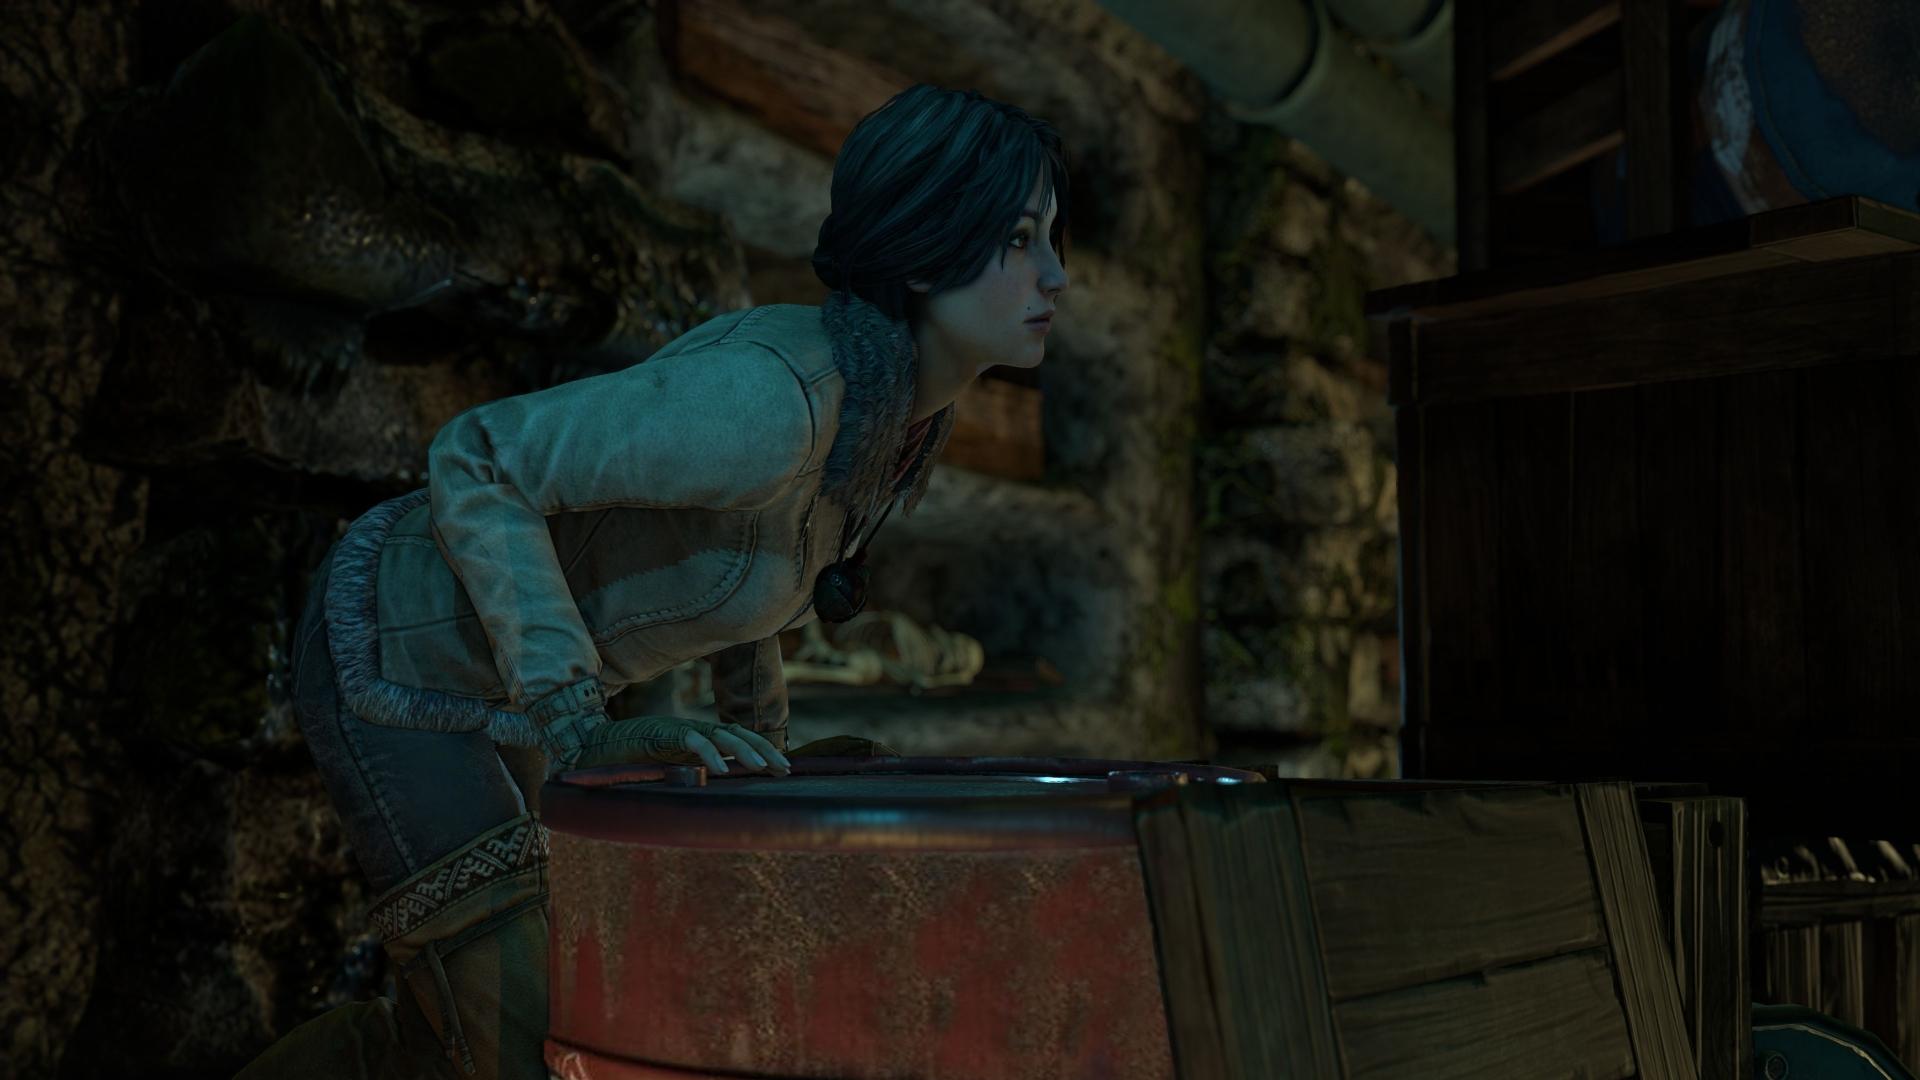 Сибирь 3 / Syberia 3: Deluxe Edition [v 3.0 + DLC] (2017/PC/Русский), Repack от =nemos=